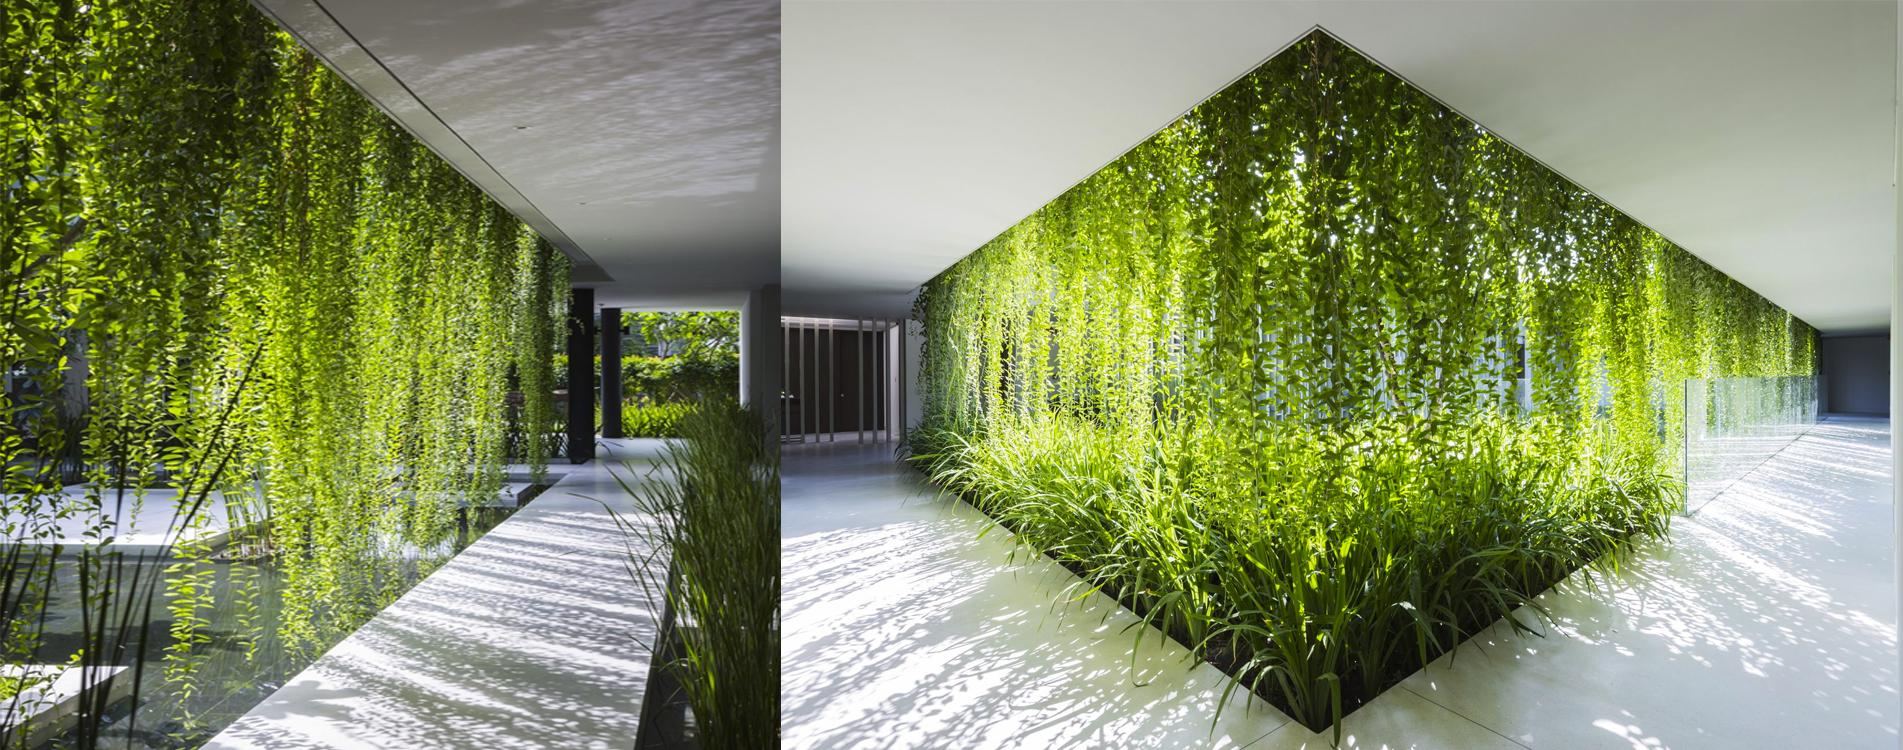 Zohrab Bauer Architects Green 5